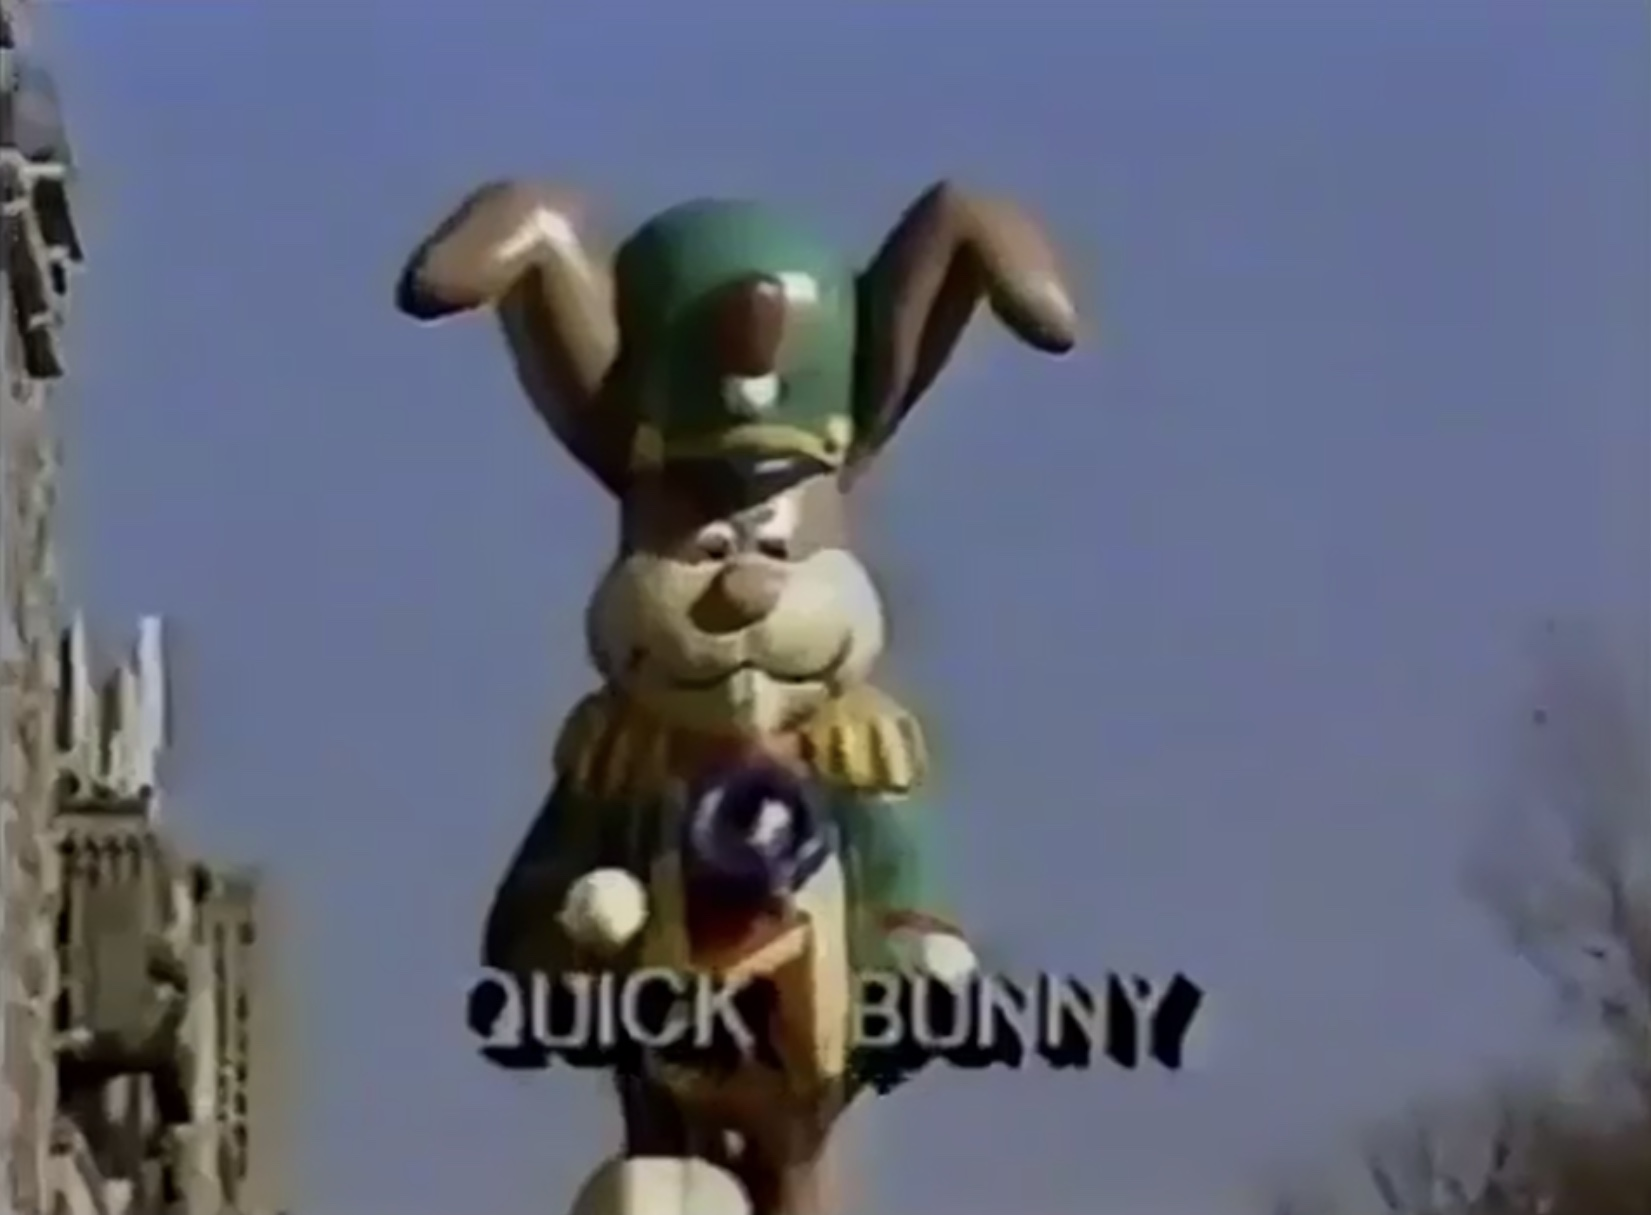 Aavilamara/Quik Bunny